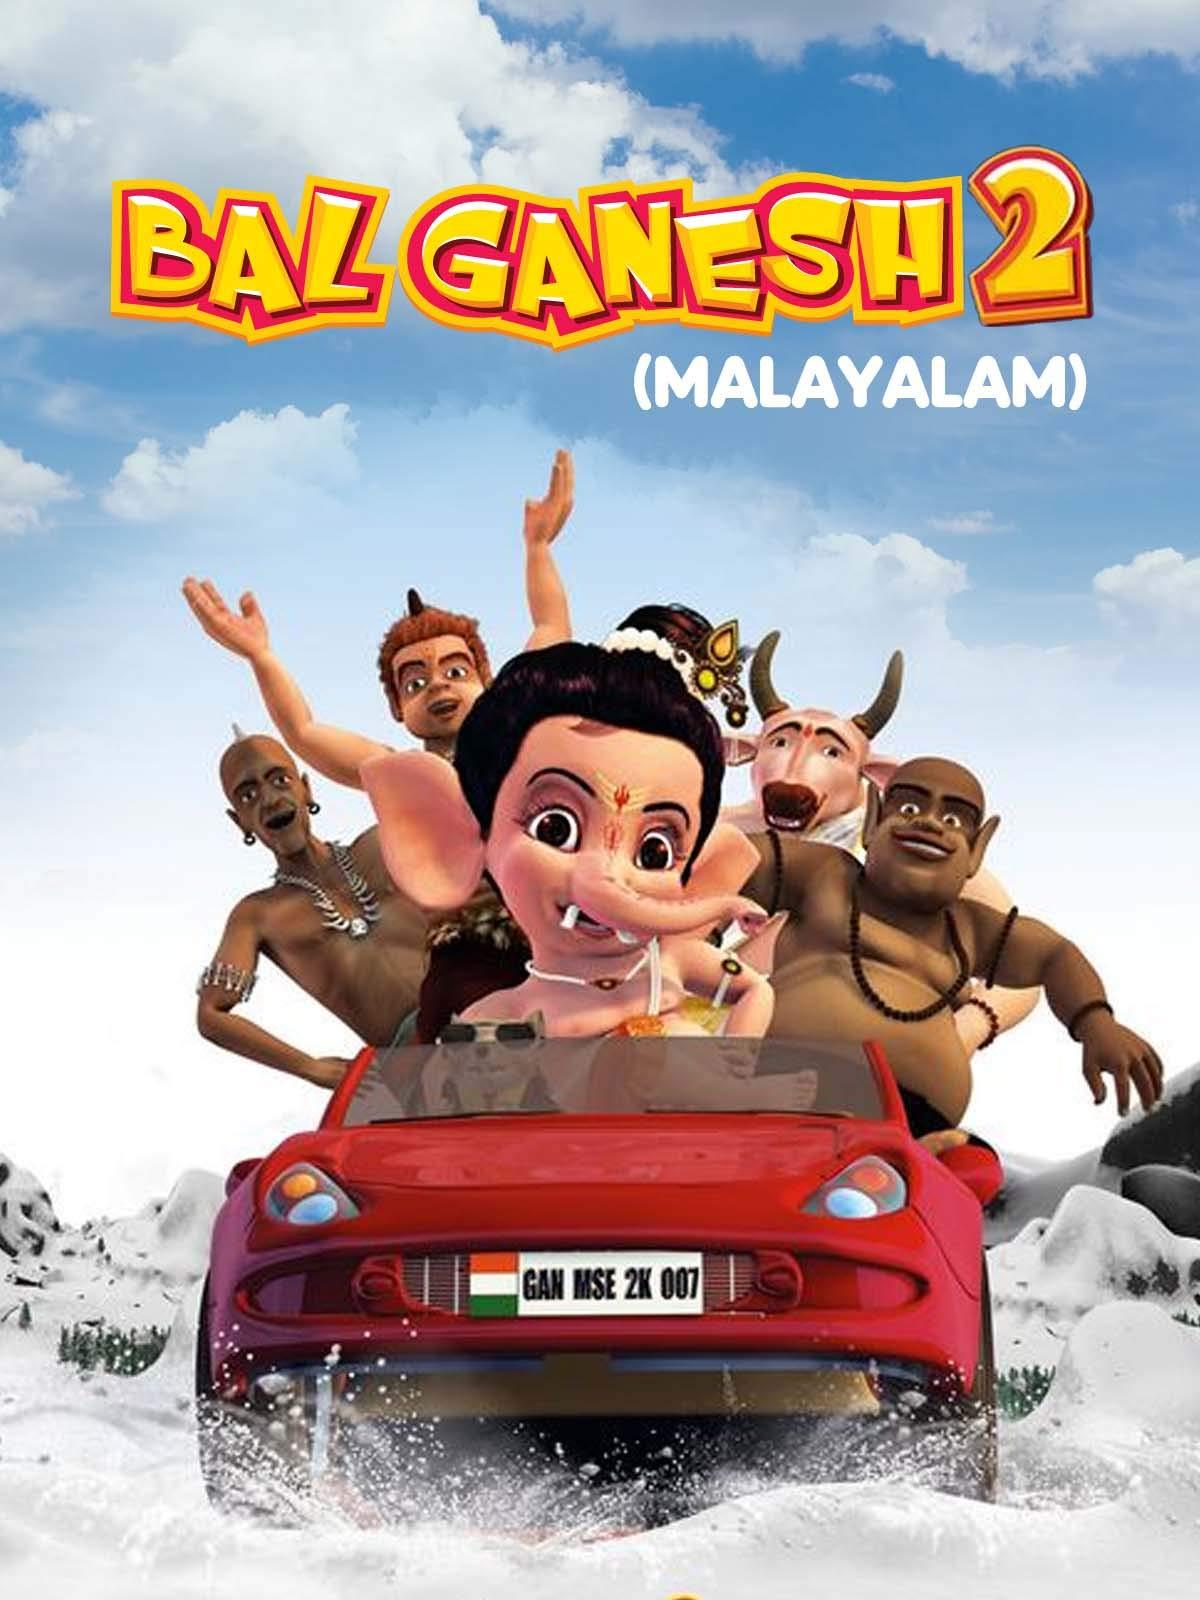 Bal Ganesh 2 (Malayalam)